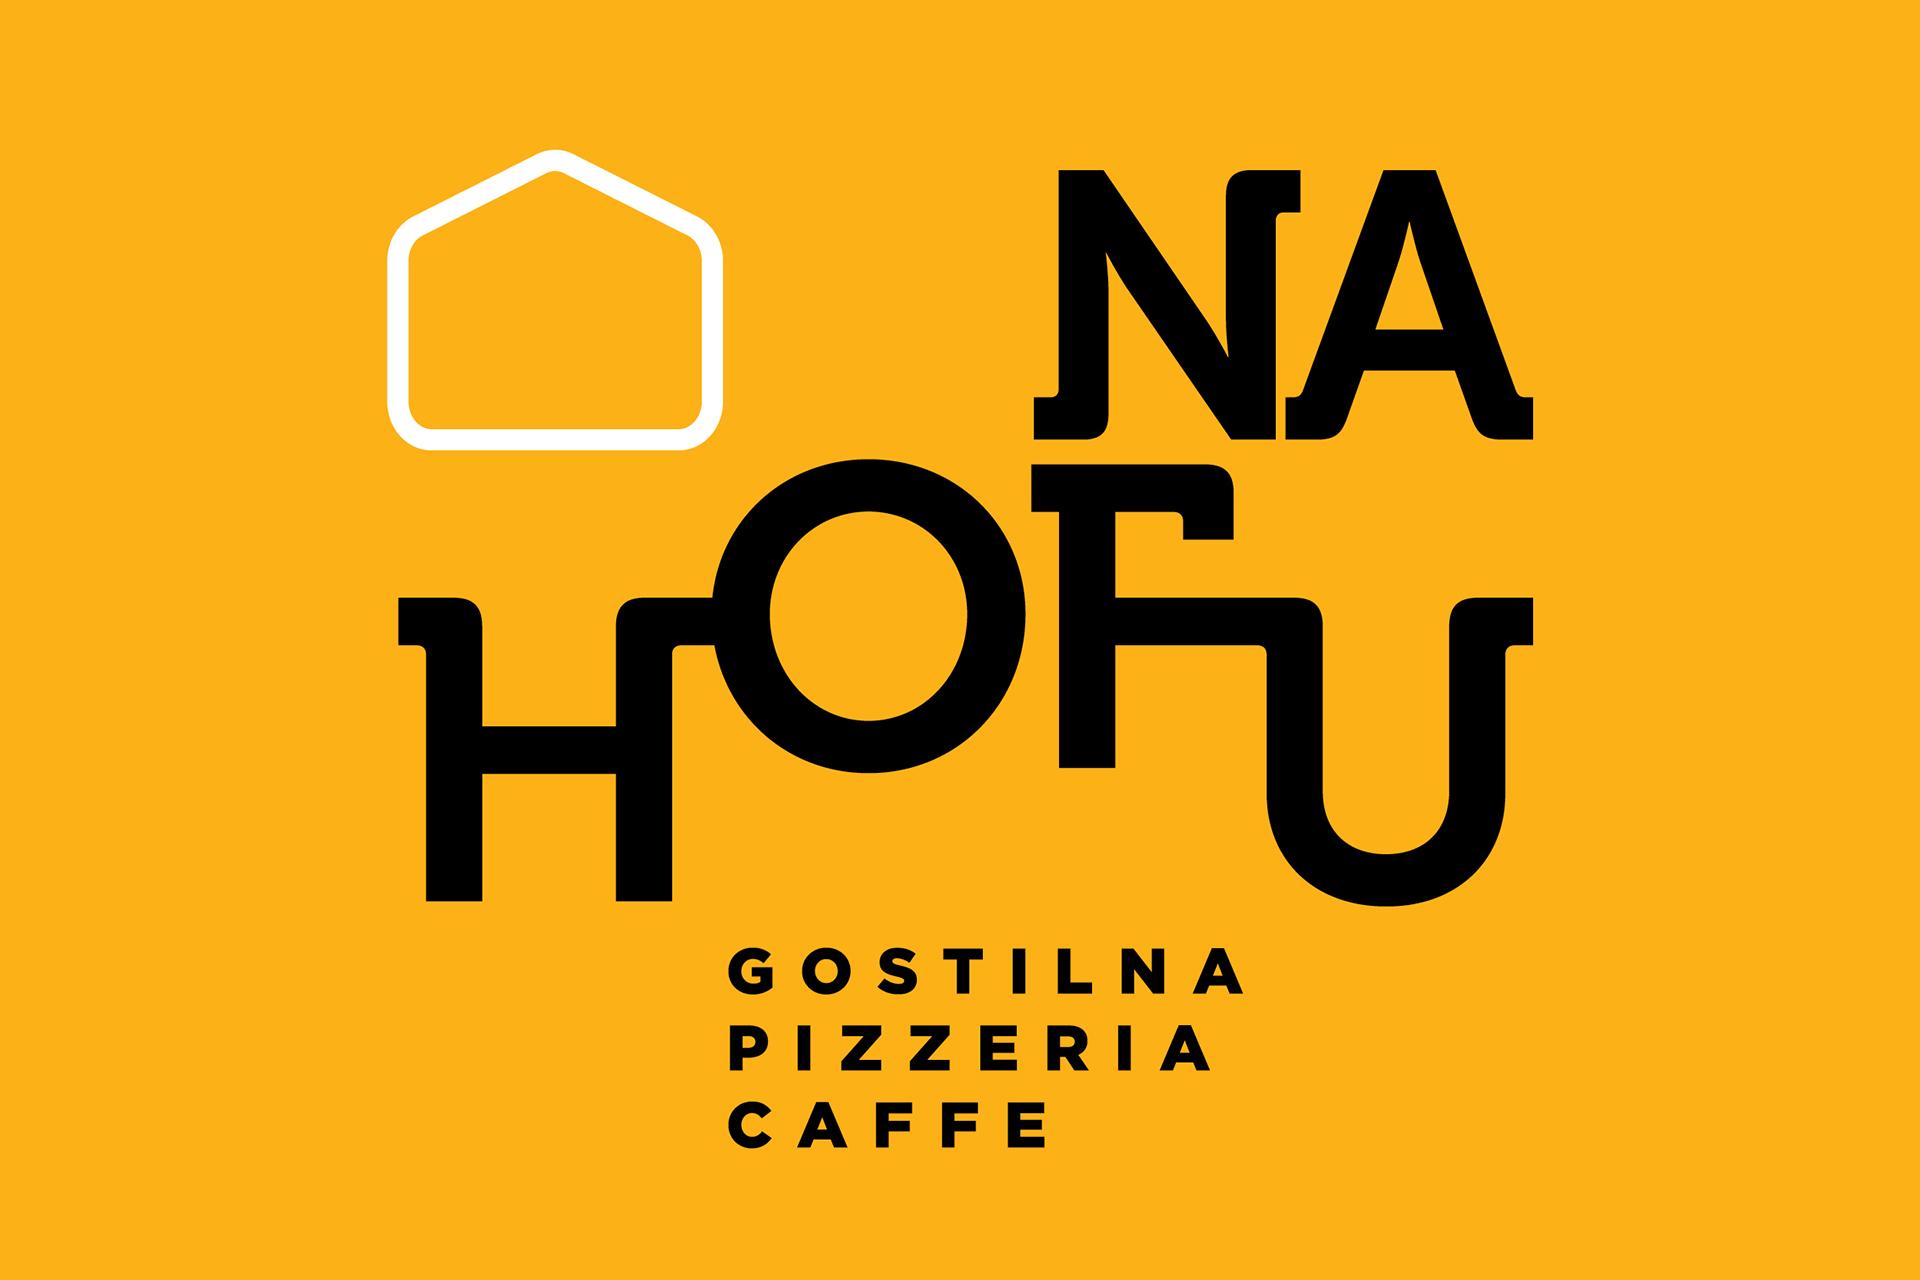 na_hofu_vizualna_podoba_marko_marinsek_ma-ma_studio_cgp_19_logo-3